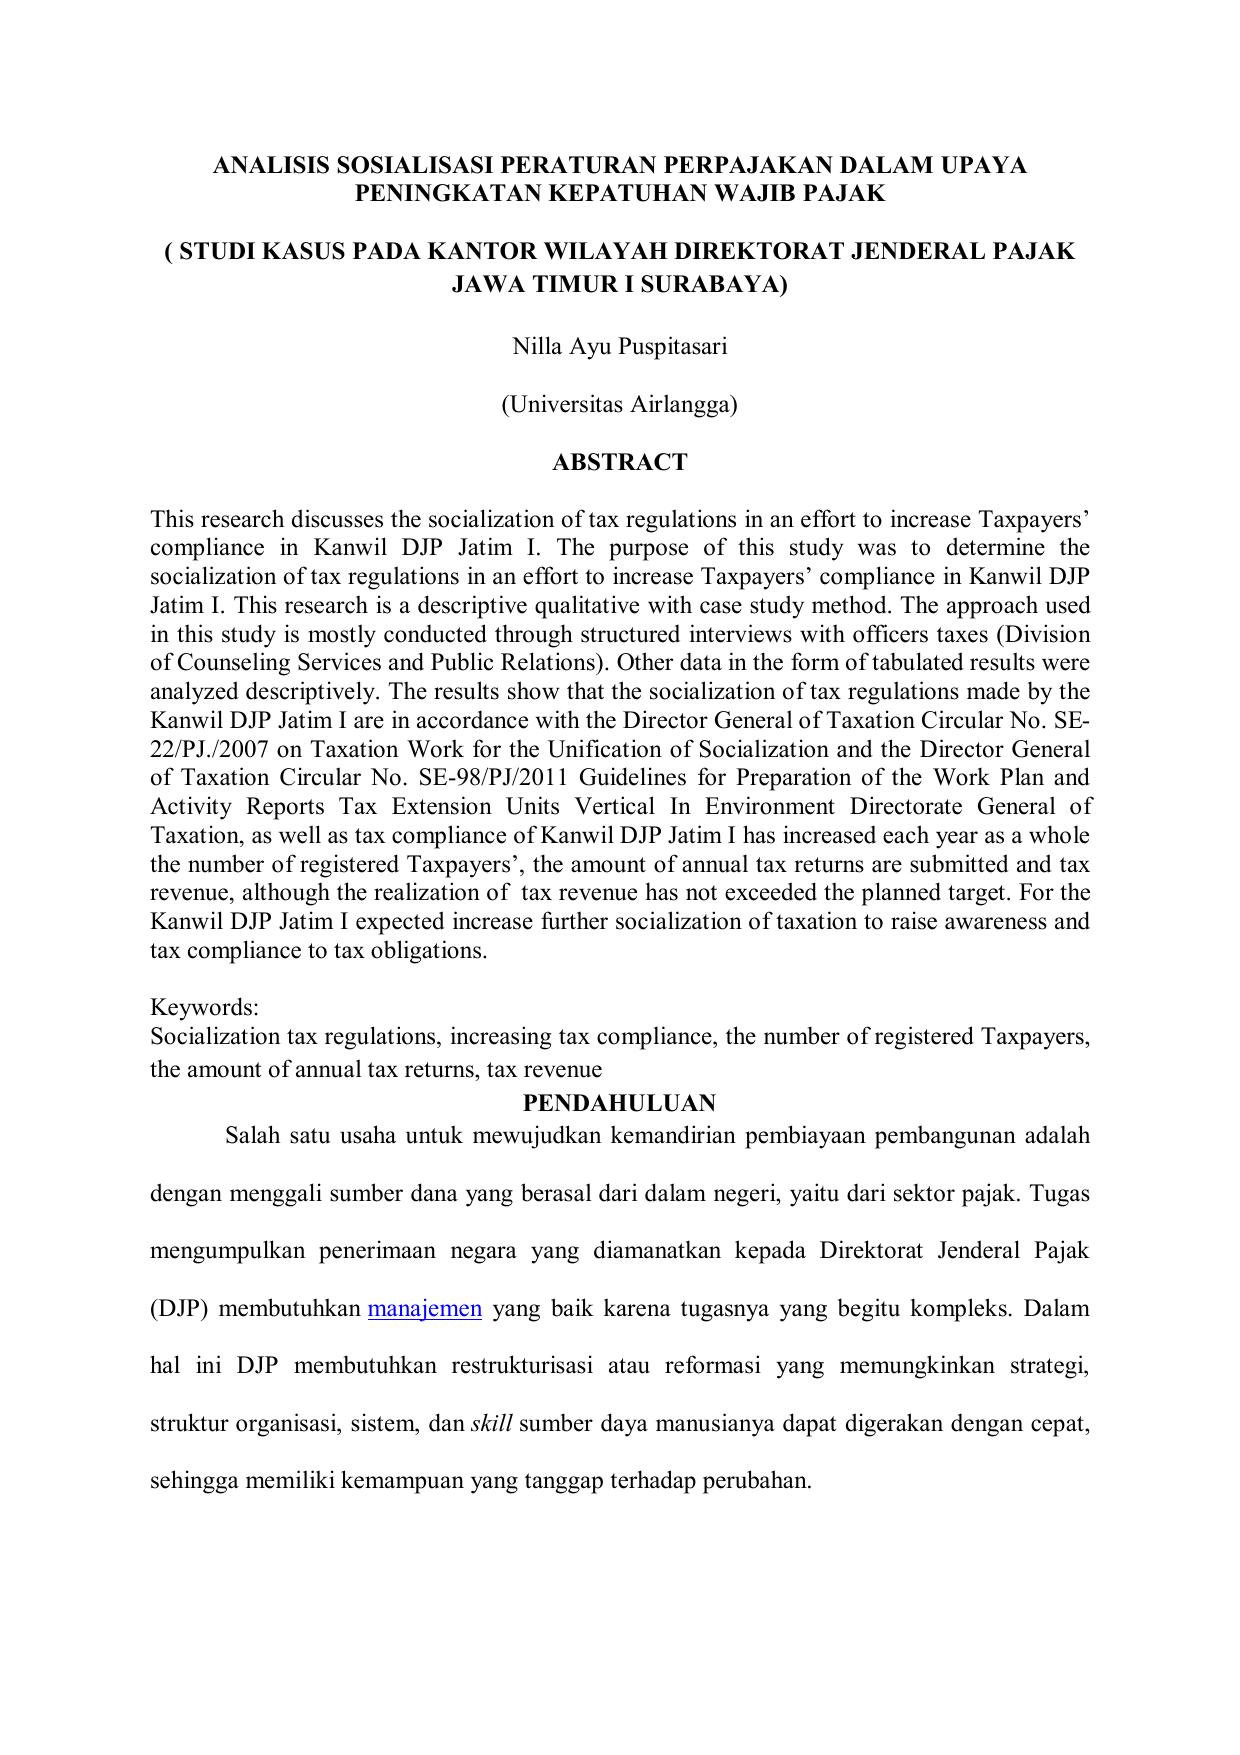 Jurnal Analisis Sosialisasi Peraturan Pe